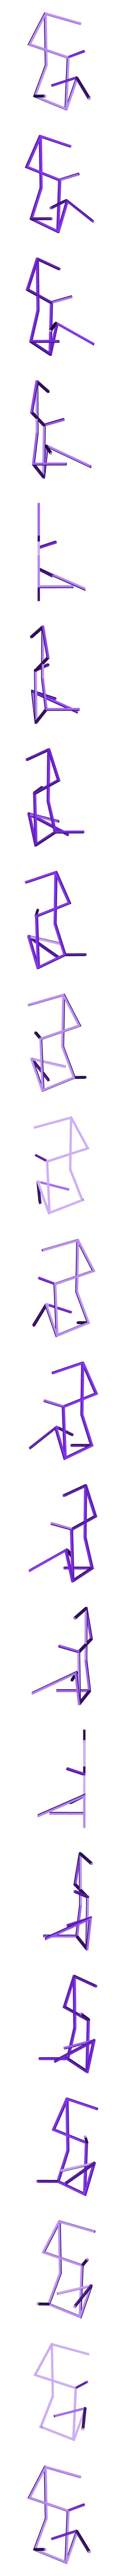 AnamorphicCube.STL Download free STL file Anamorphic Optical Illusion - 3D Cube • 3D printer object, 3DSage